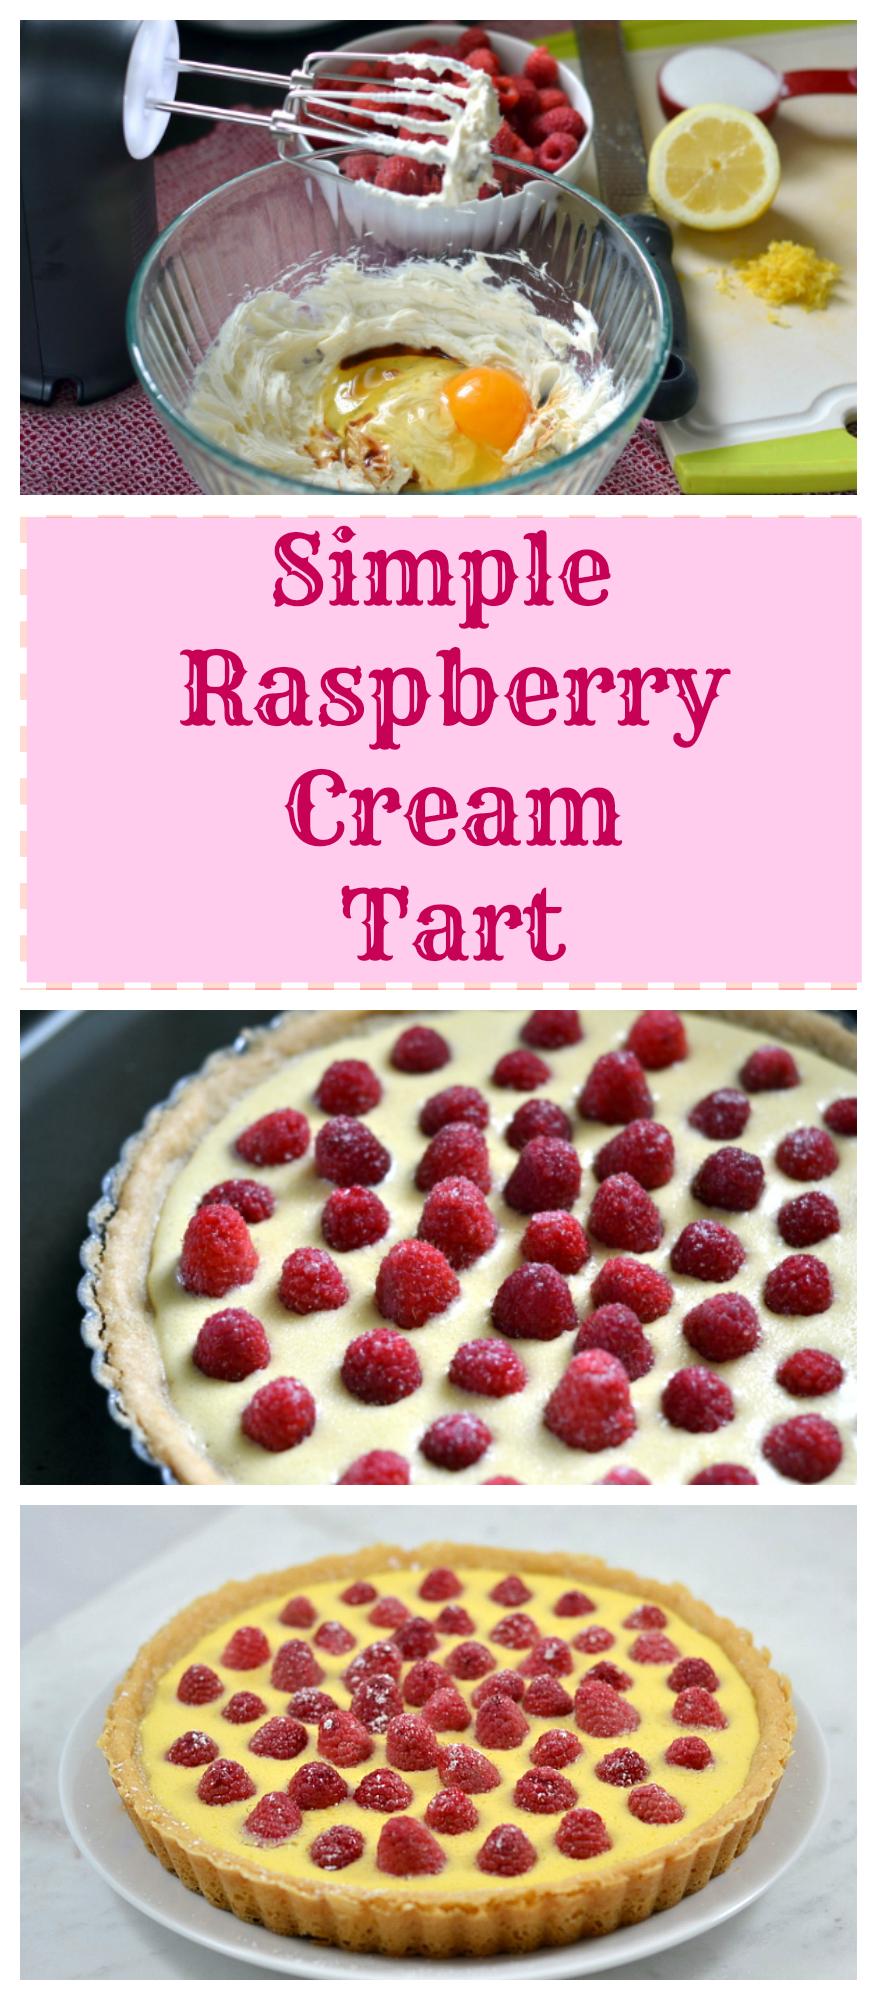 Simple Raspberry Cream Tart - Chew Nibble Nosh